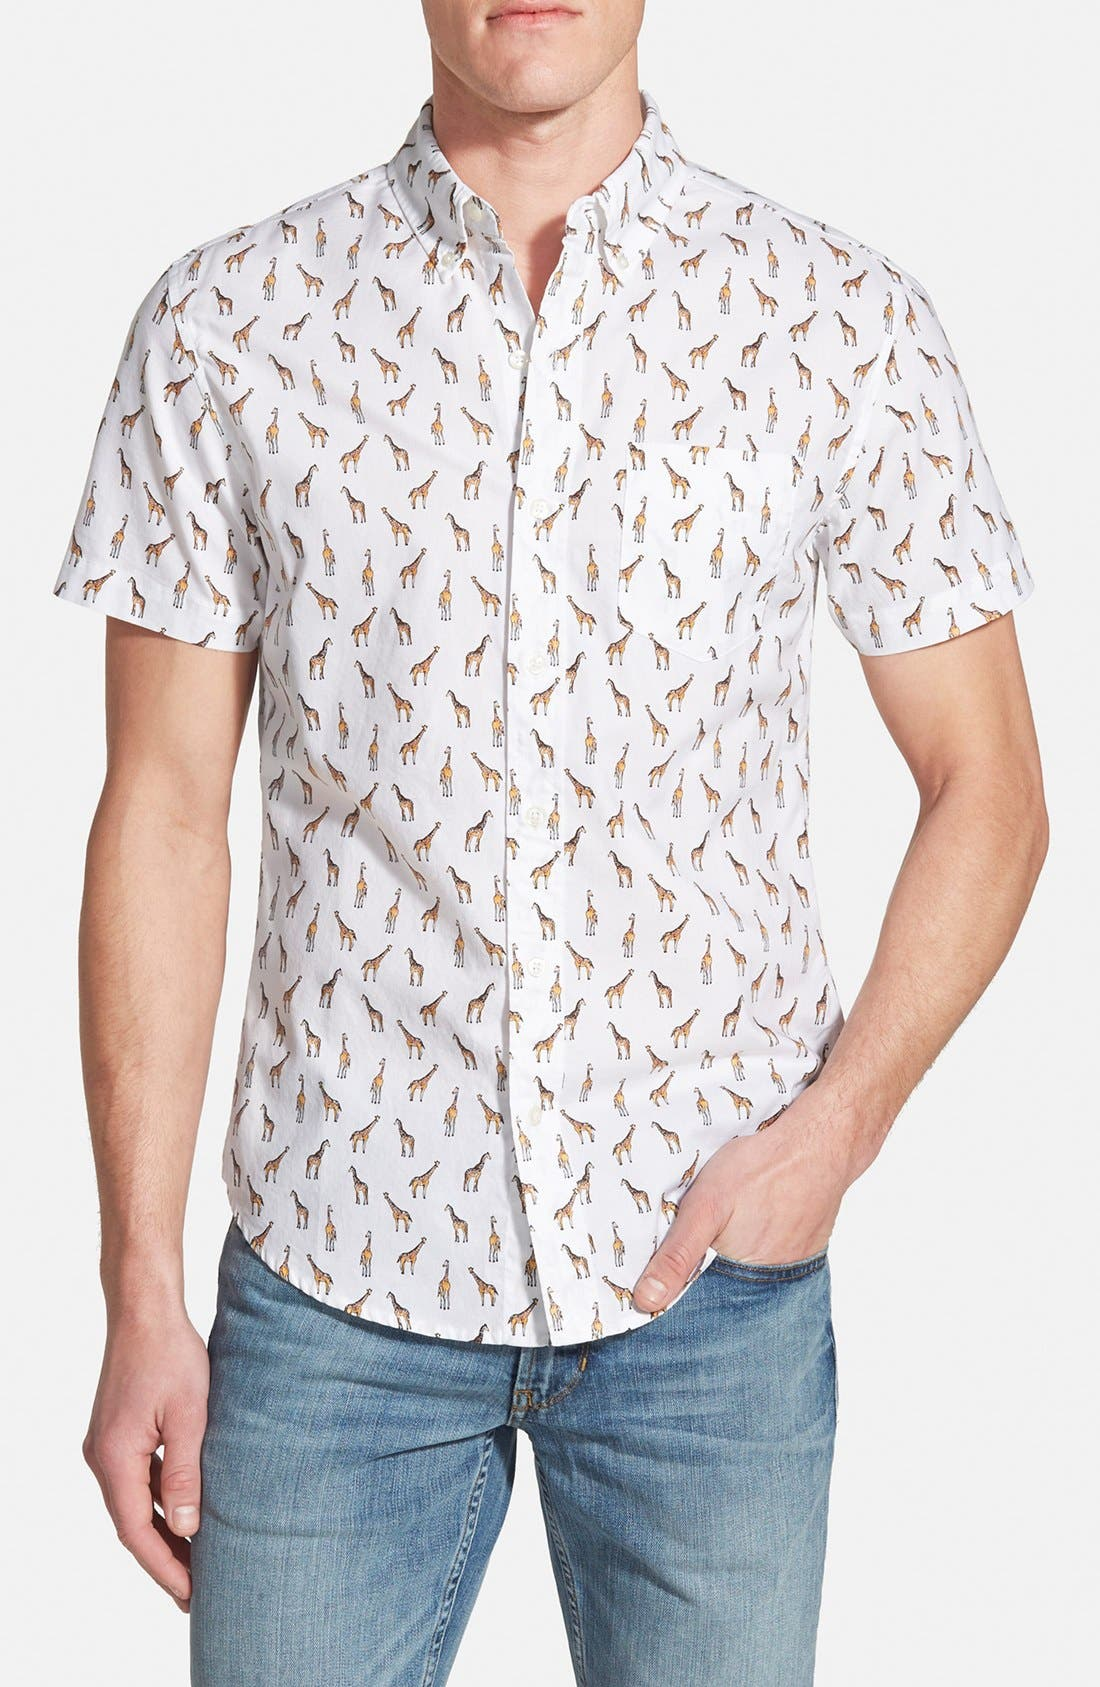 'Giraffe Tower Print' Slim Fit Short Sleeve Sport Shirt, Main, color, 100